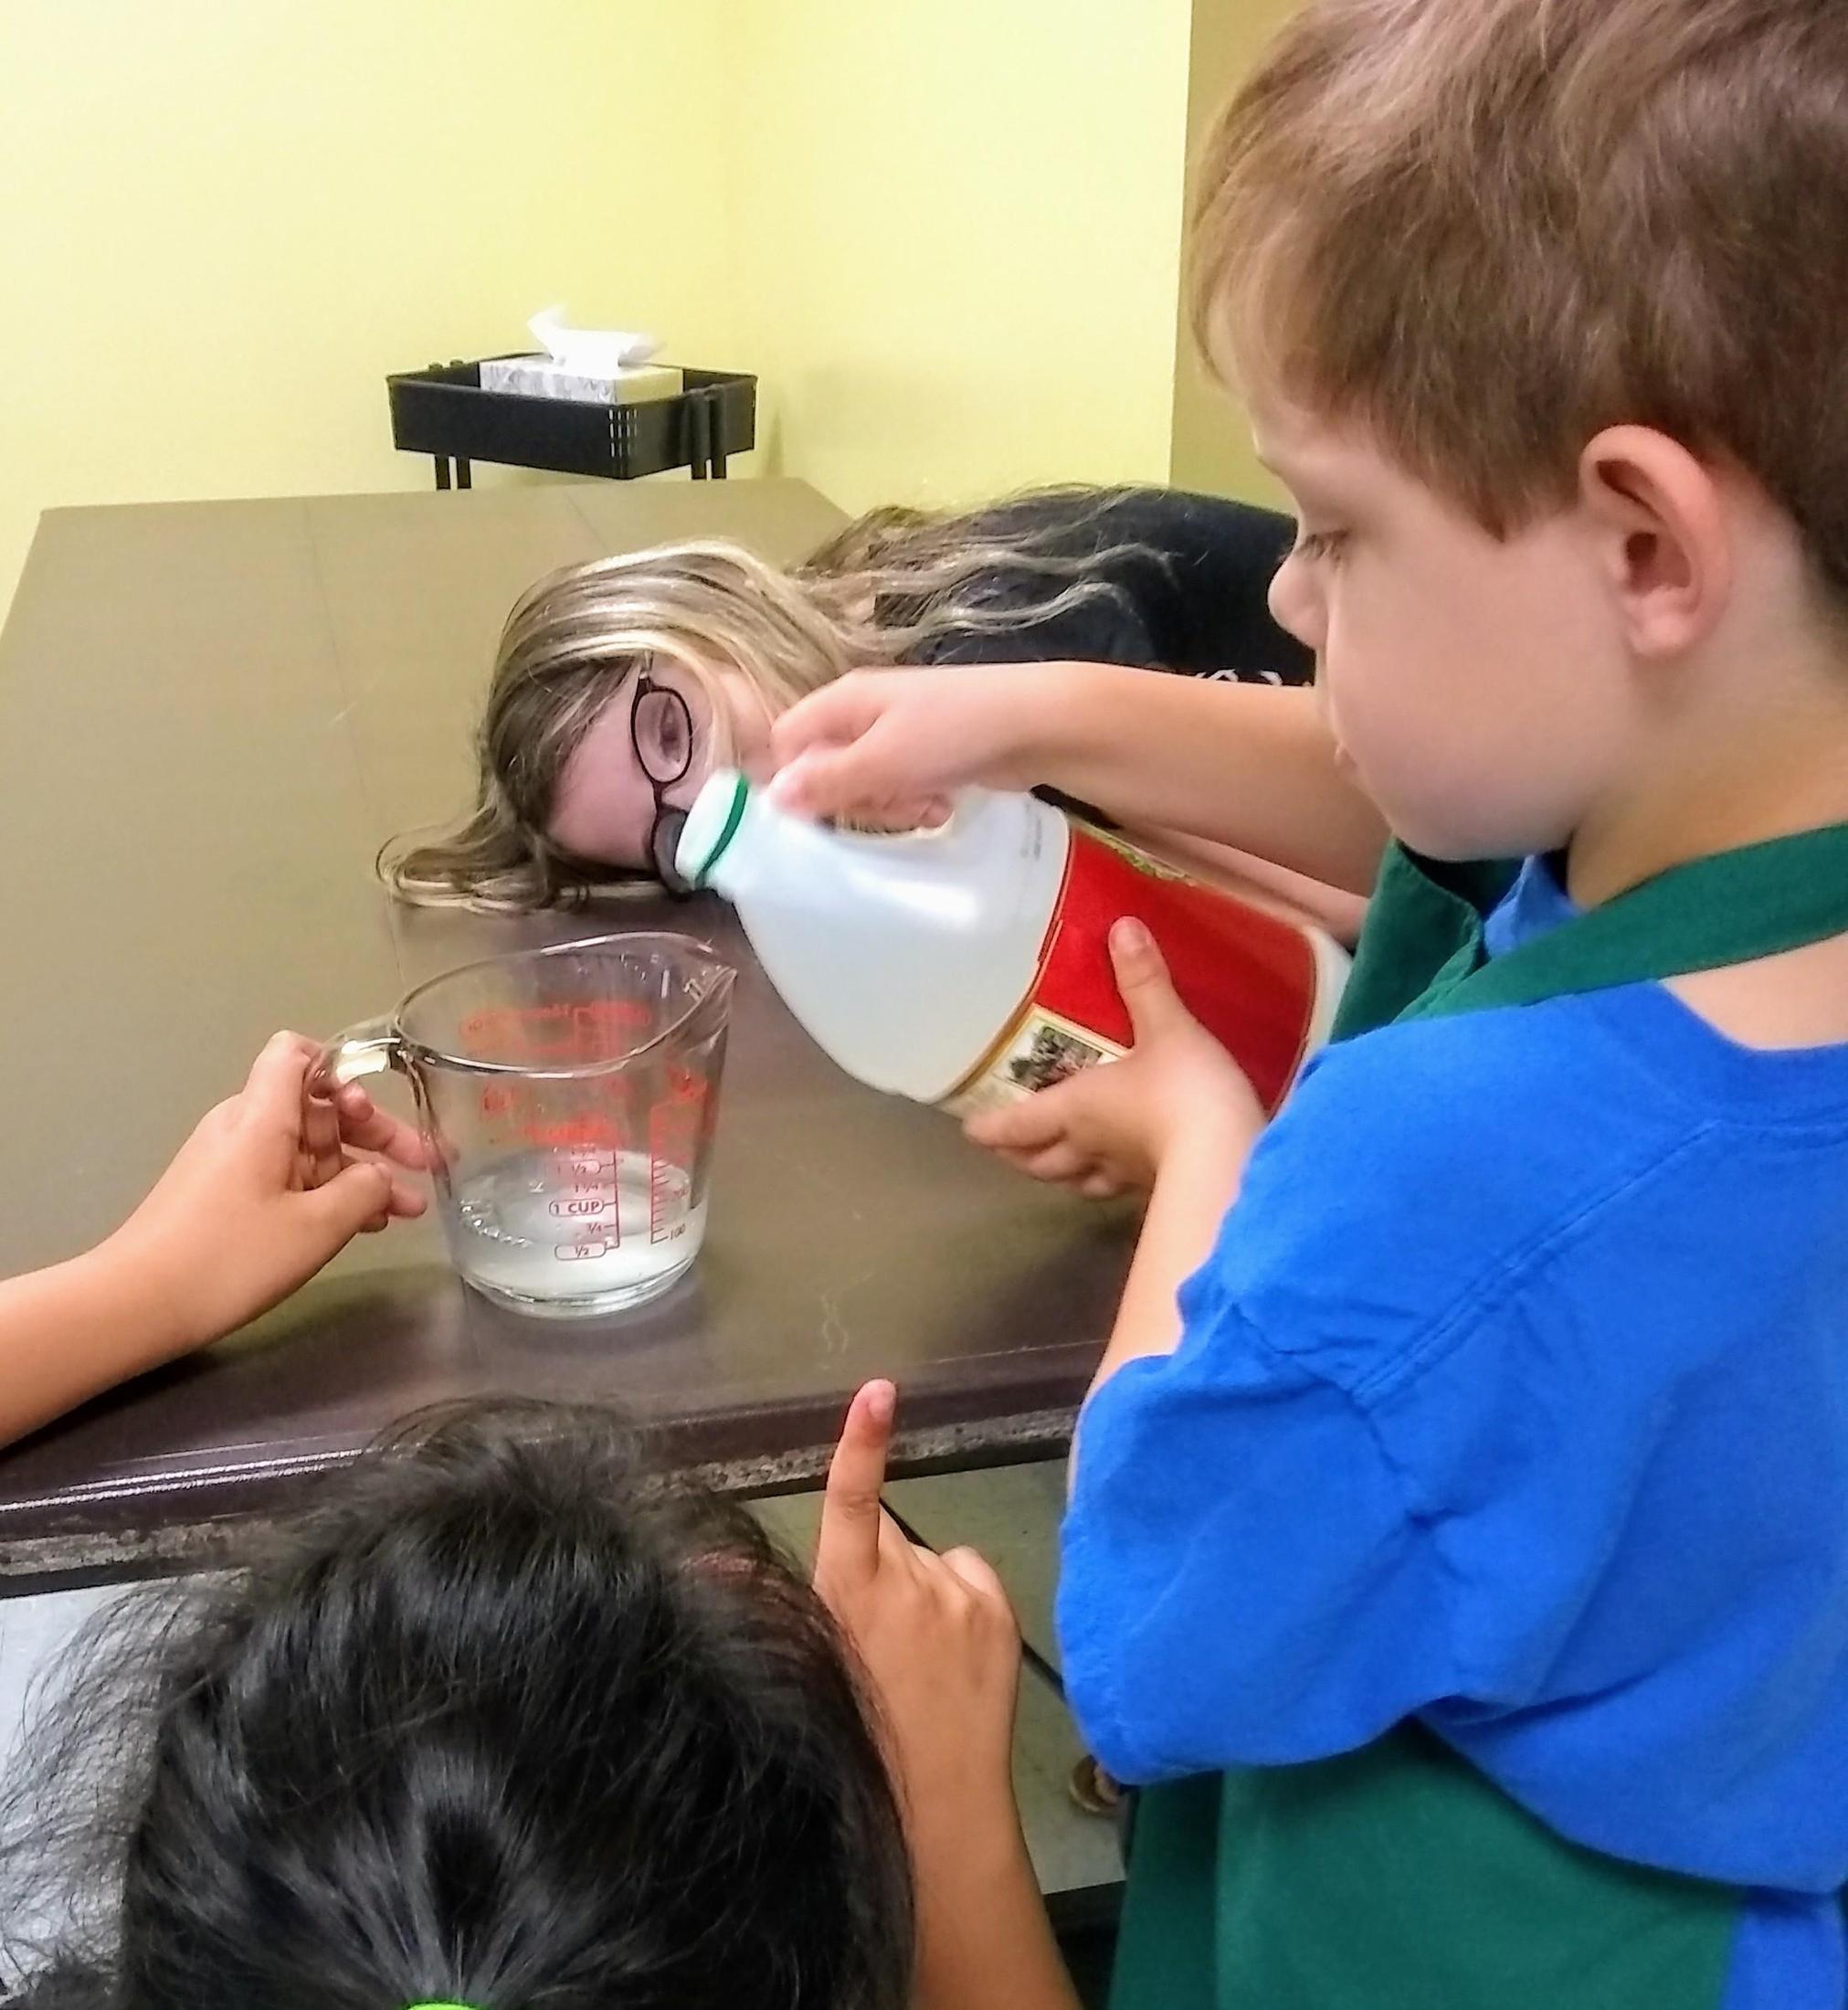 students measuring vinegar into a cup